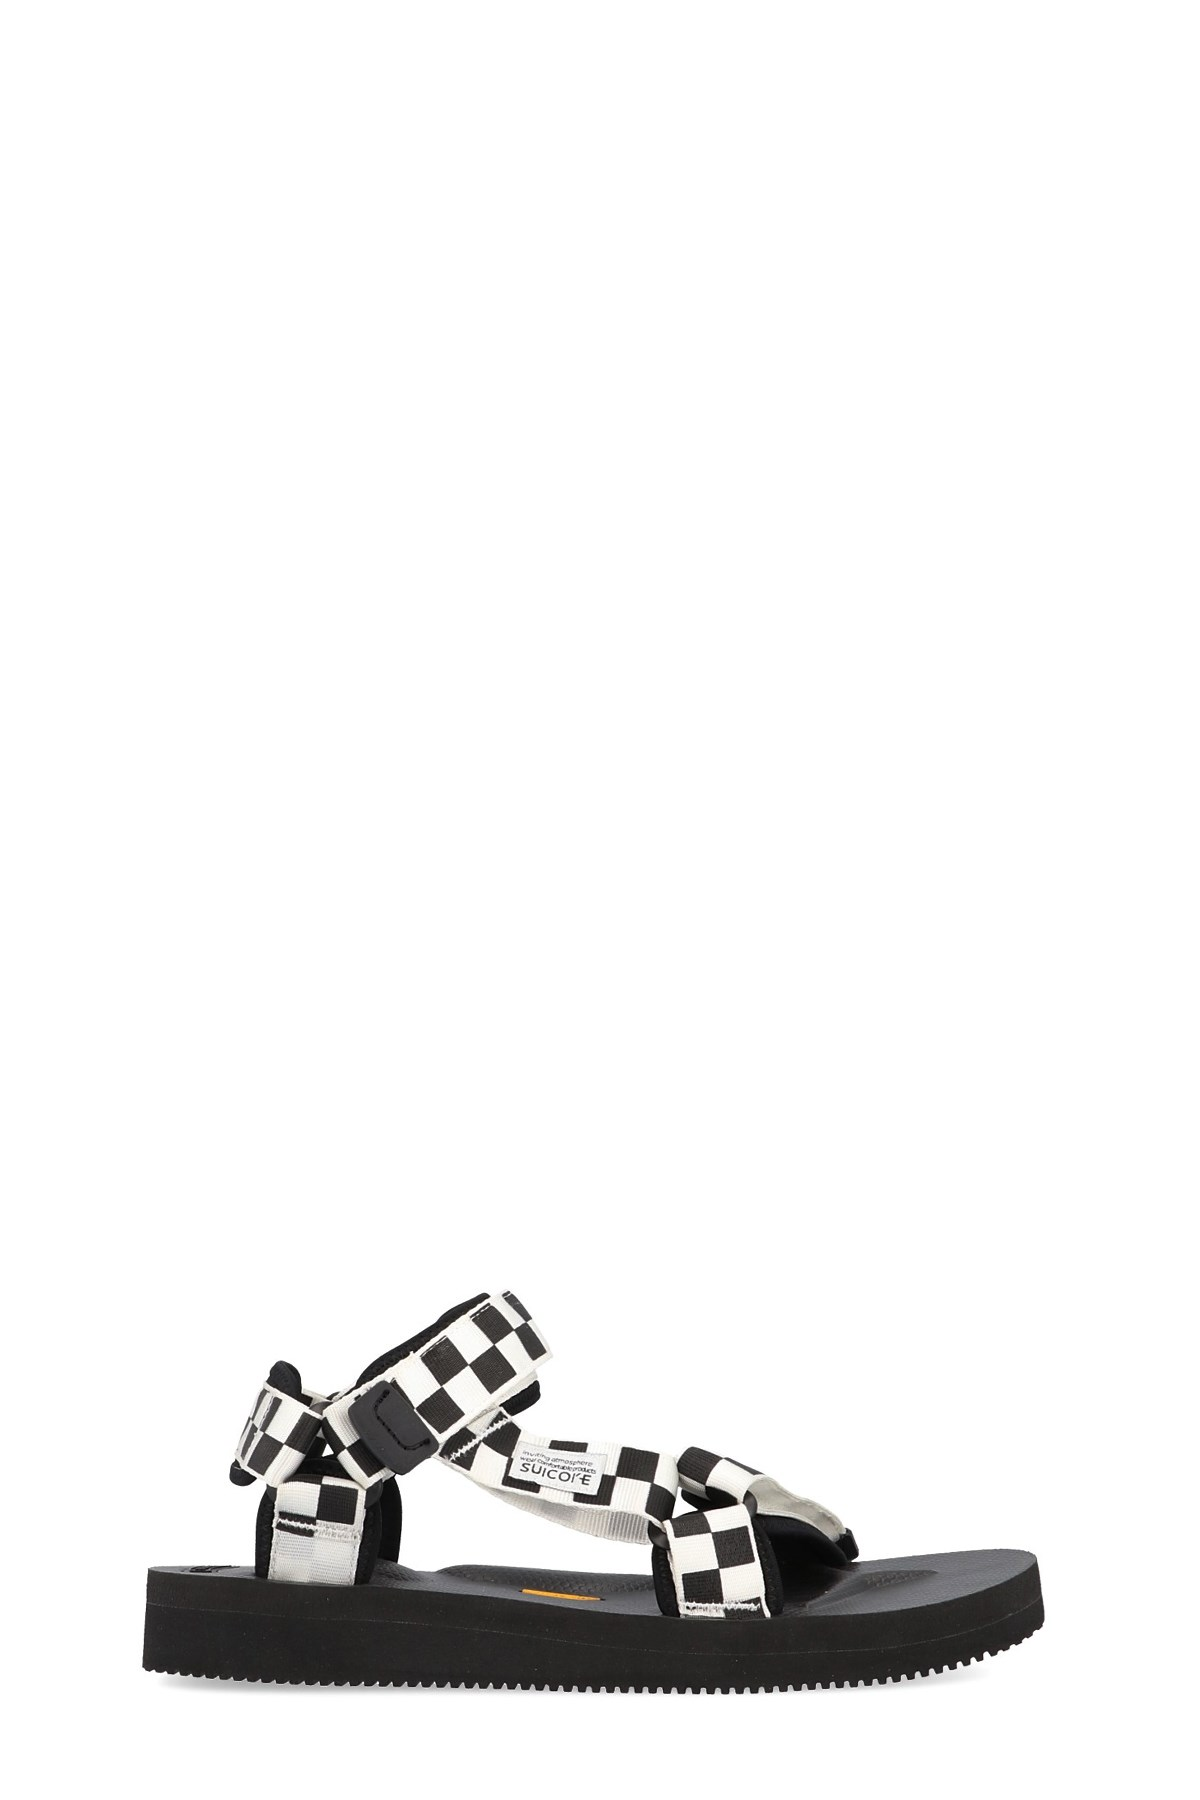 f18cbb3ec8b suicoke  Depa  sandals available on julian-fashion.com - 66925